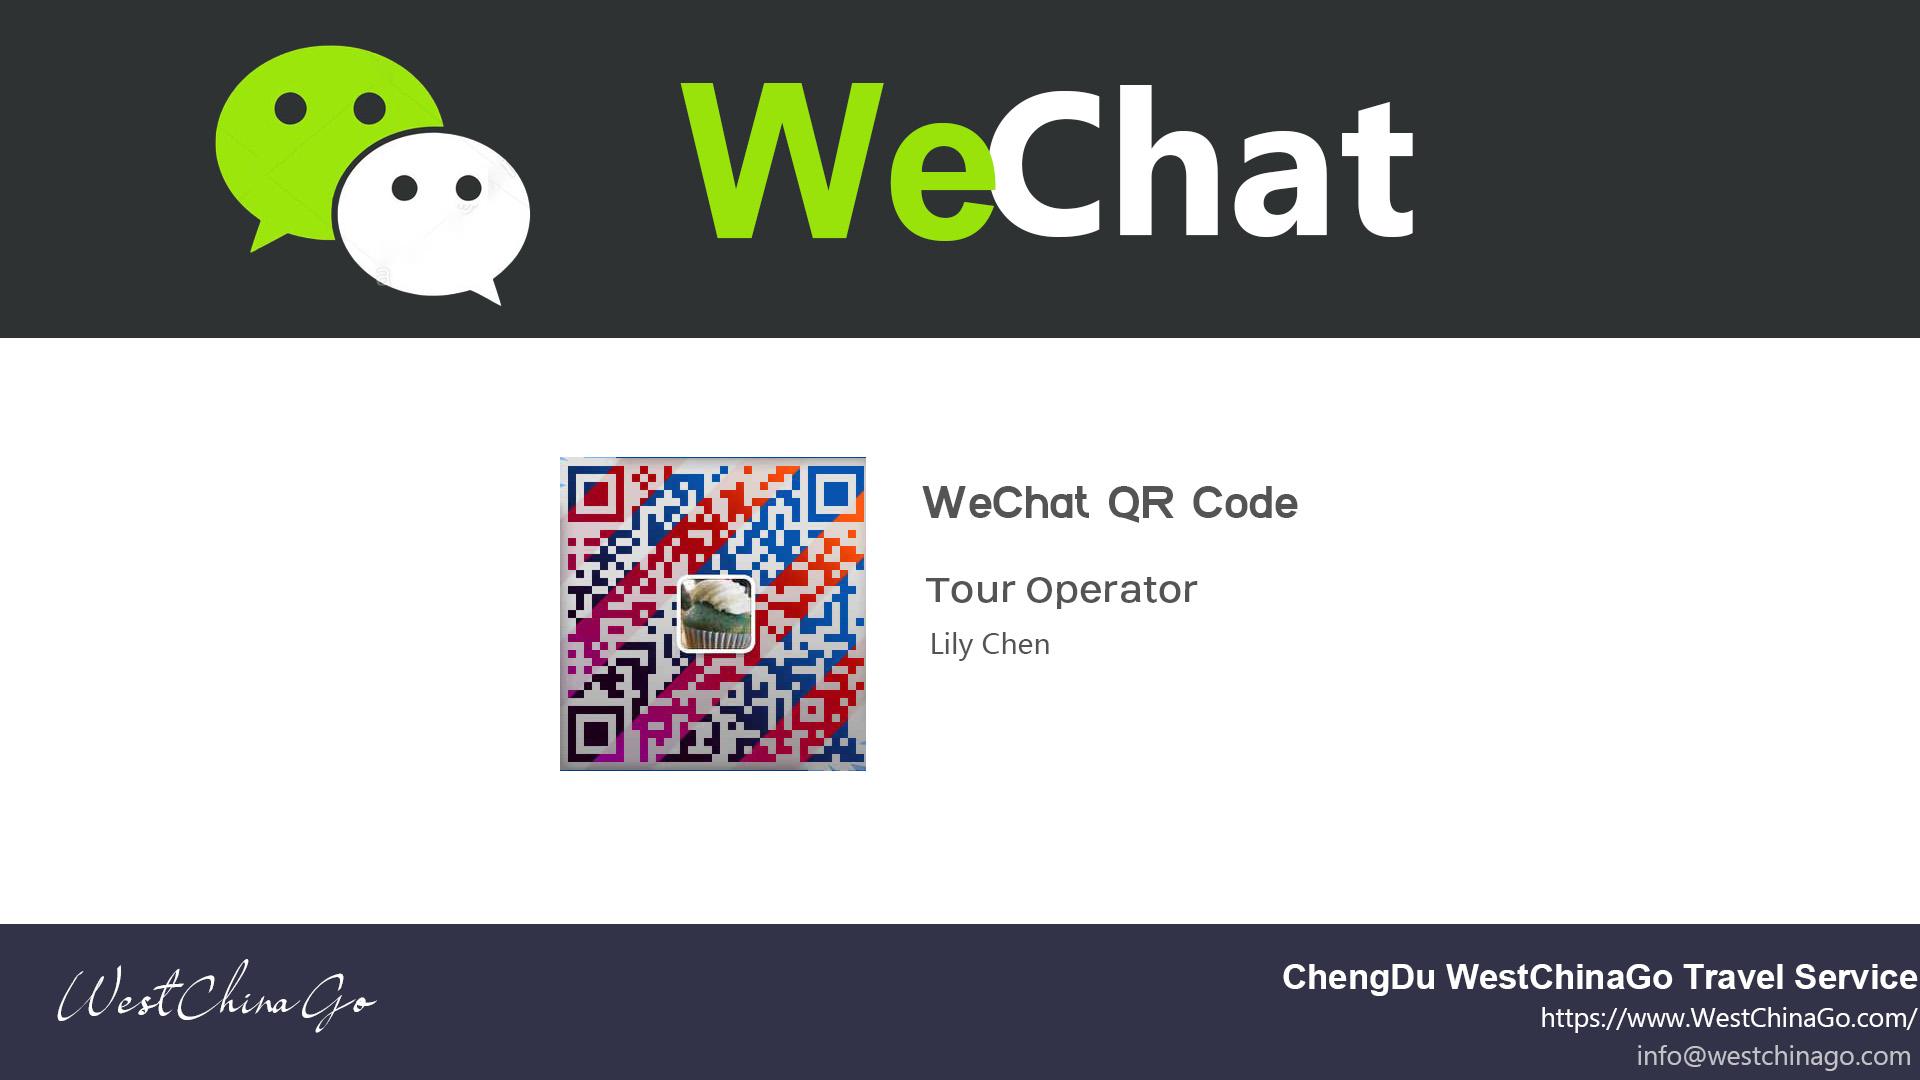 westchinago